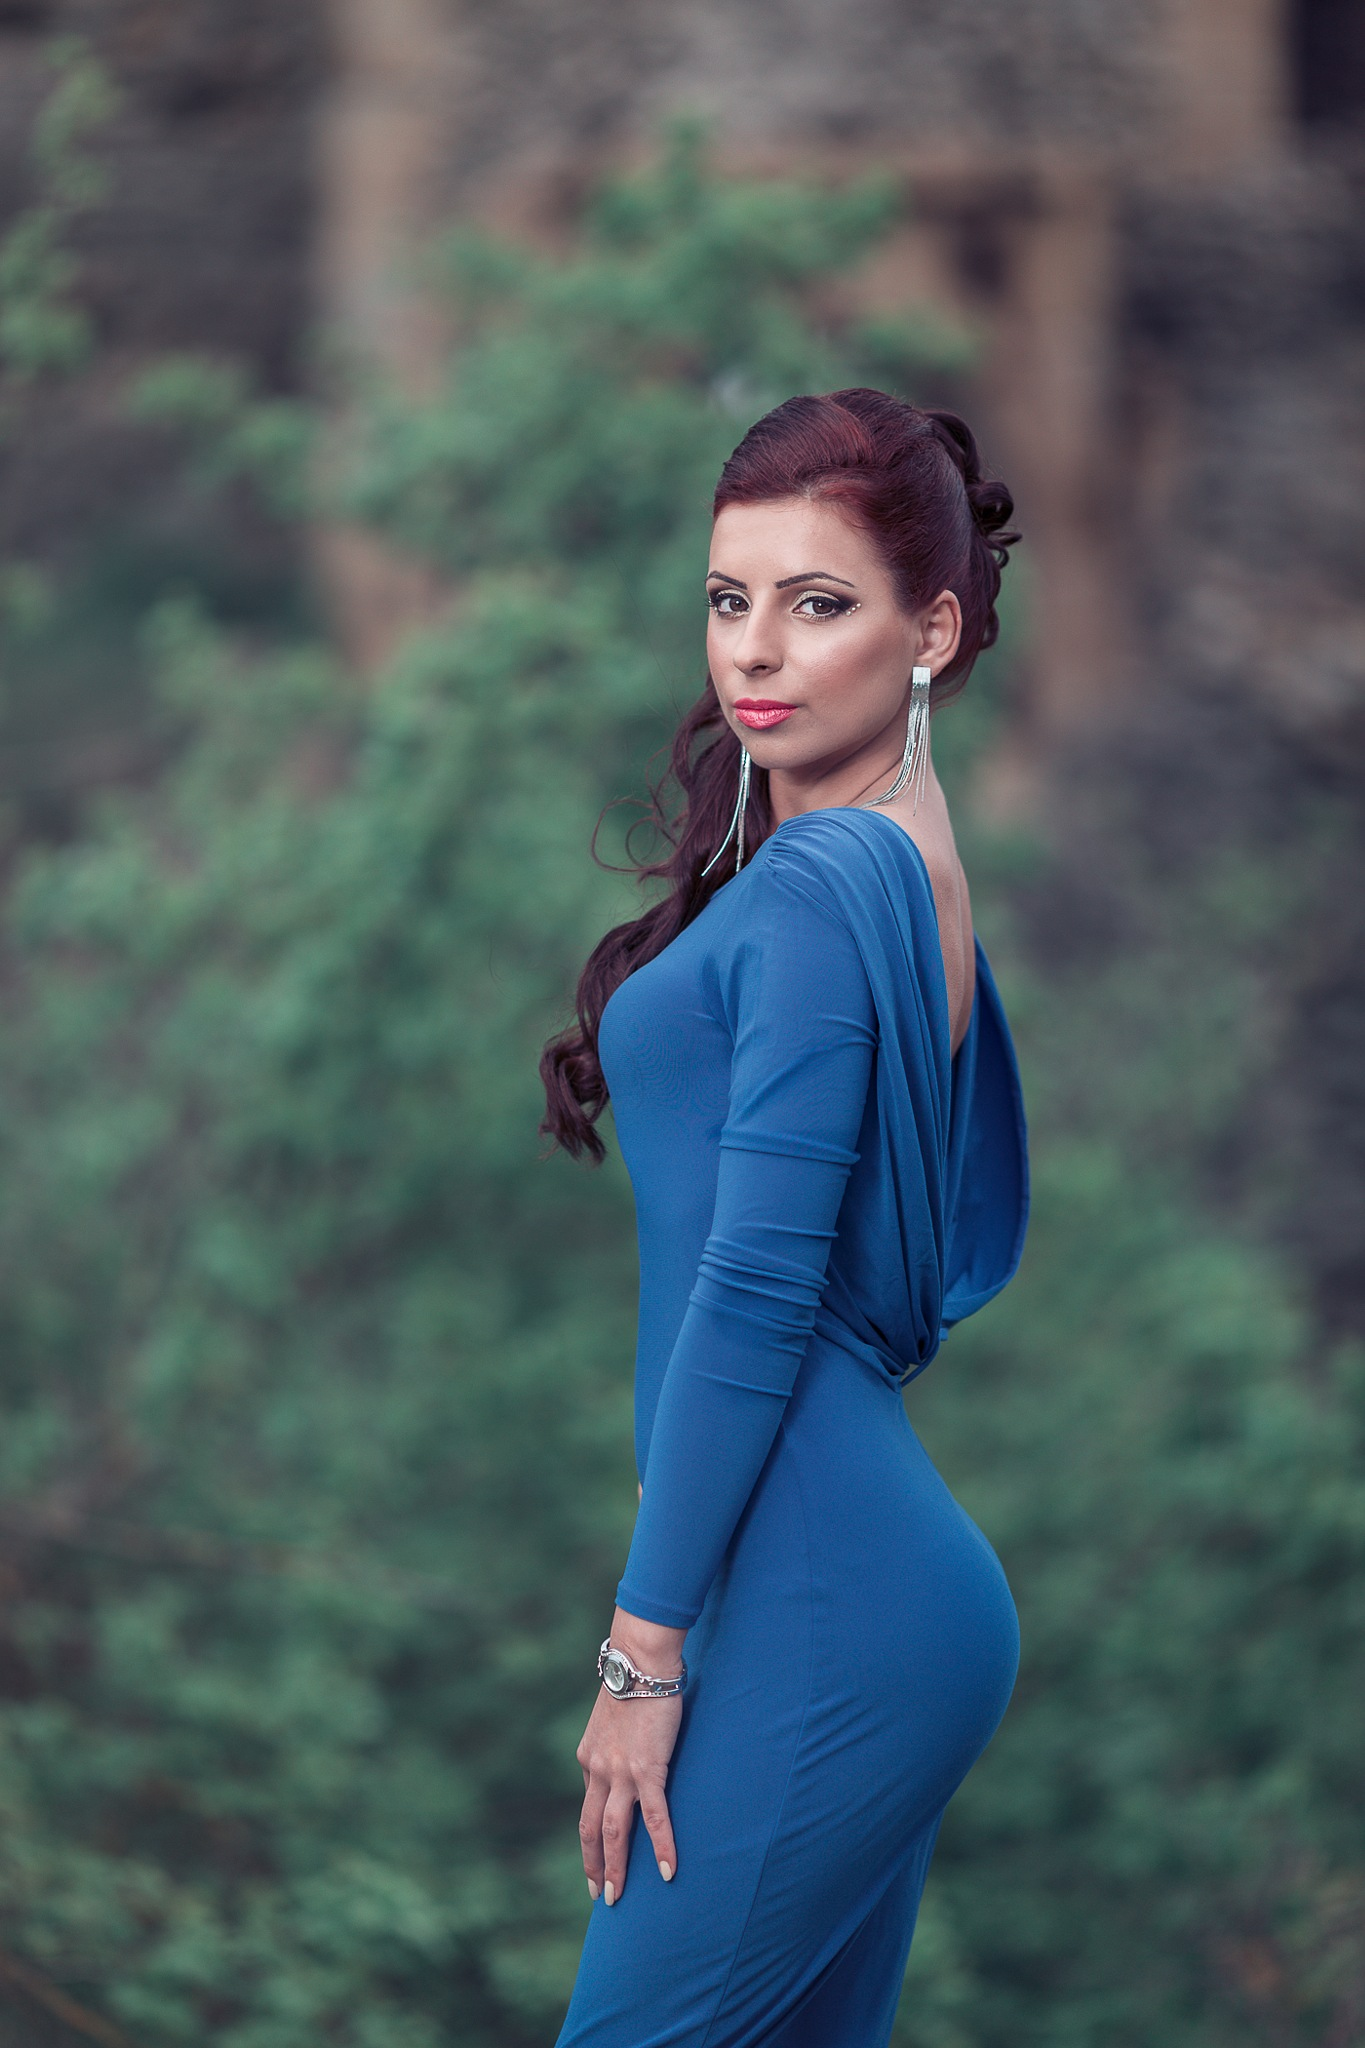 Alina by Andrea Carretta